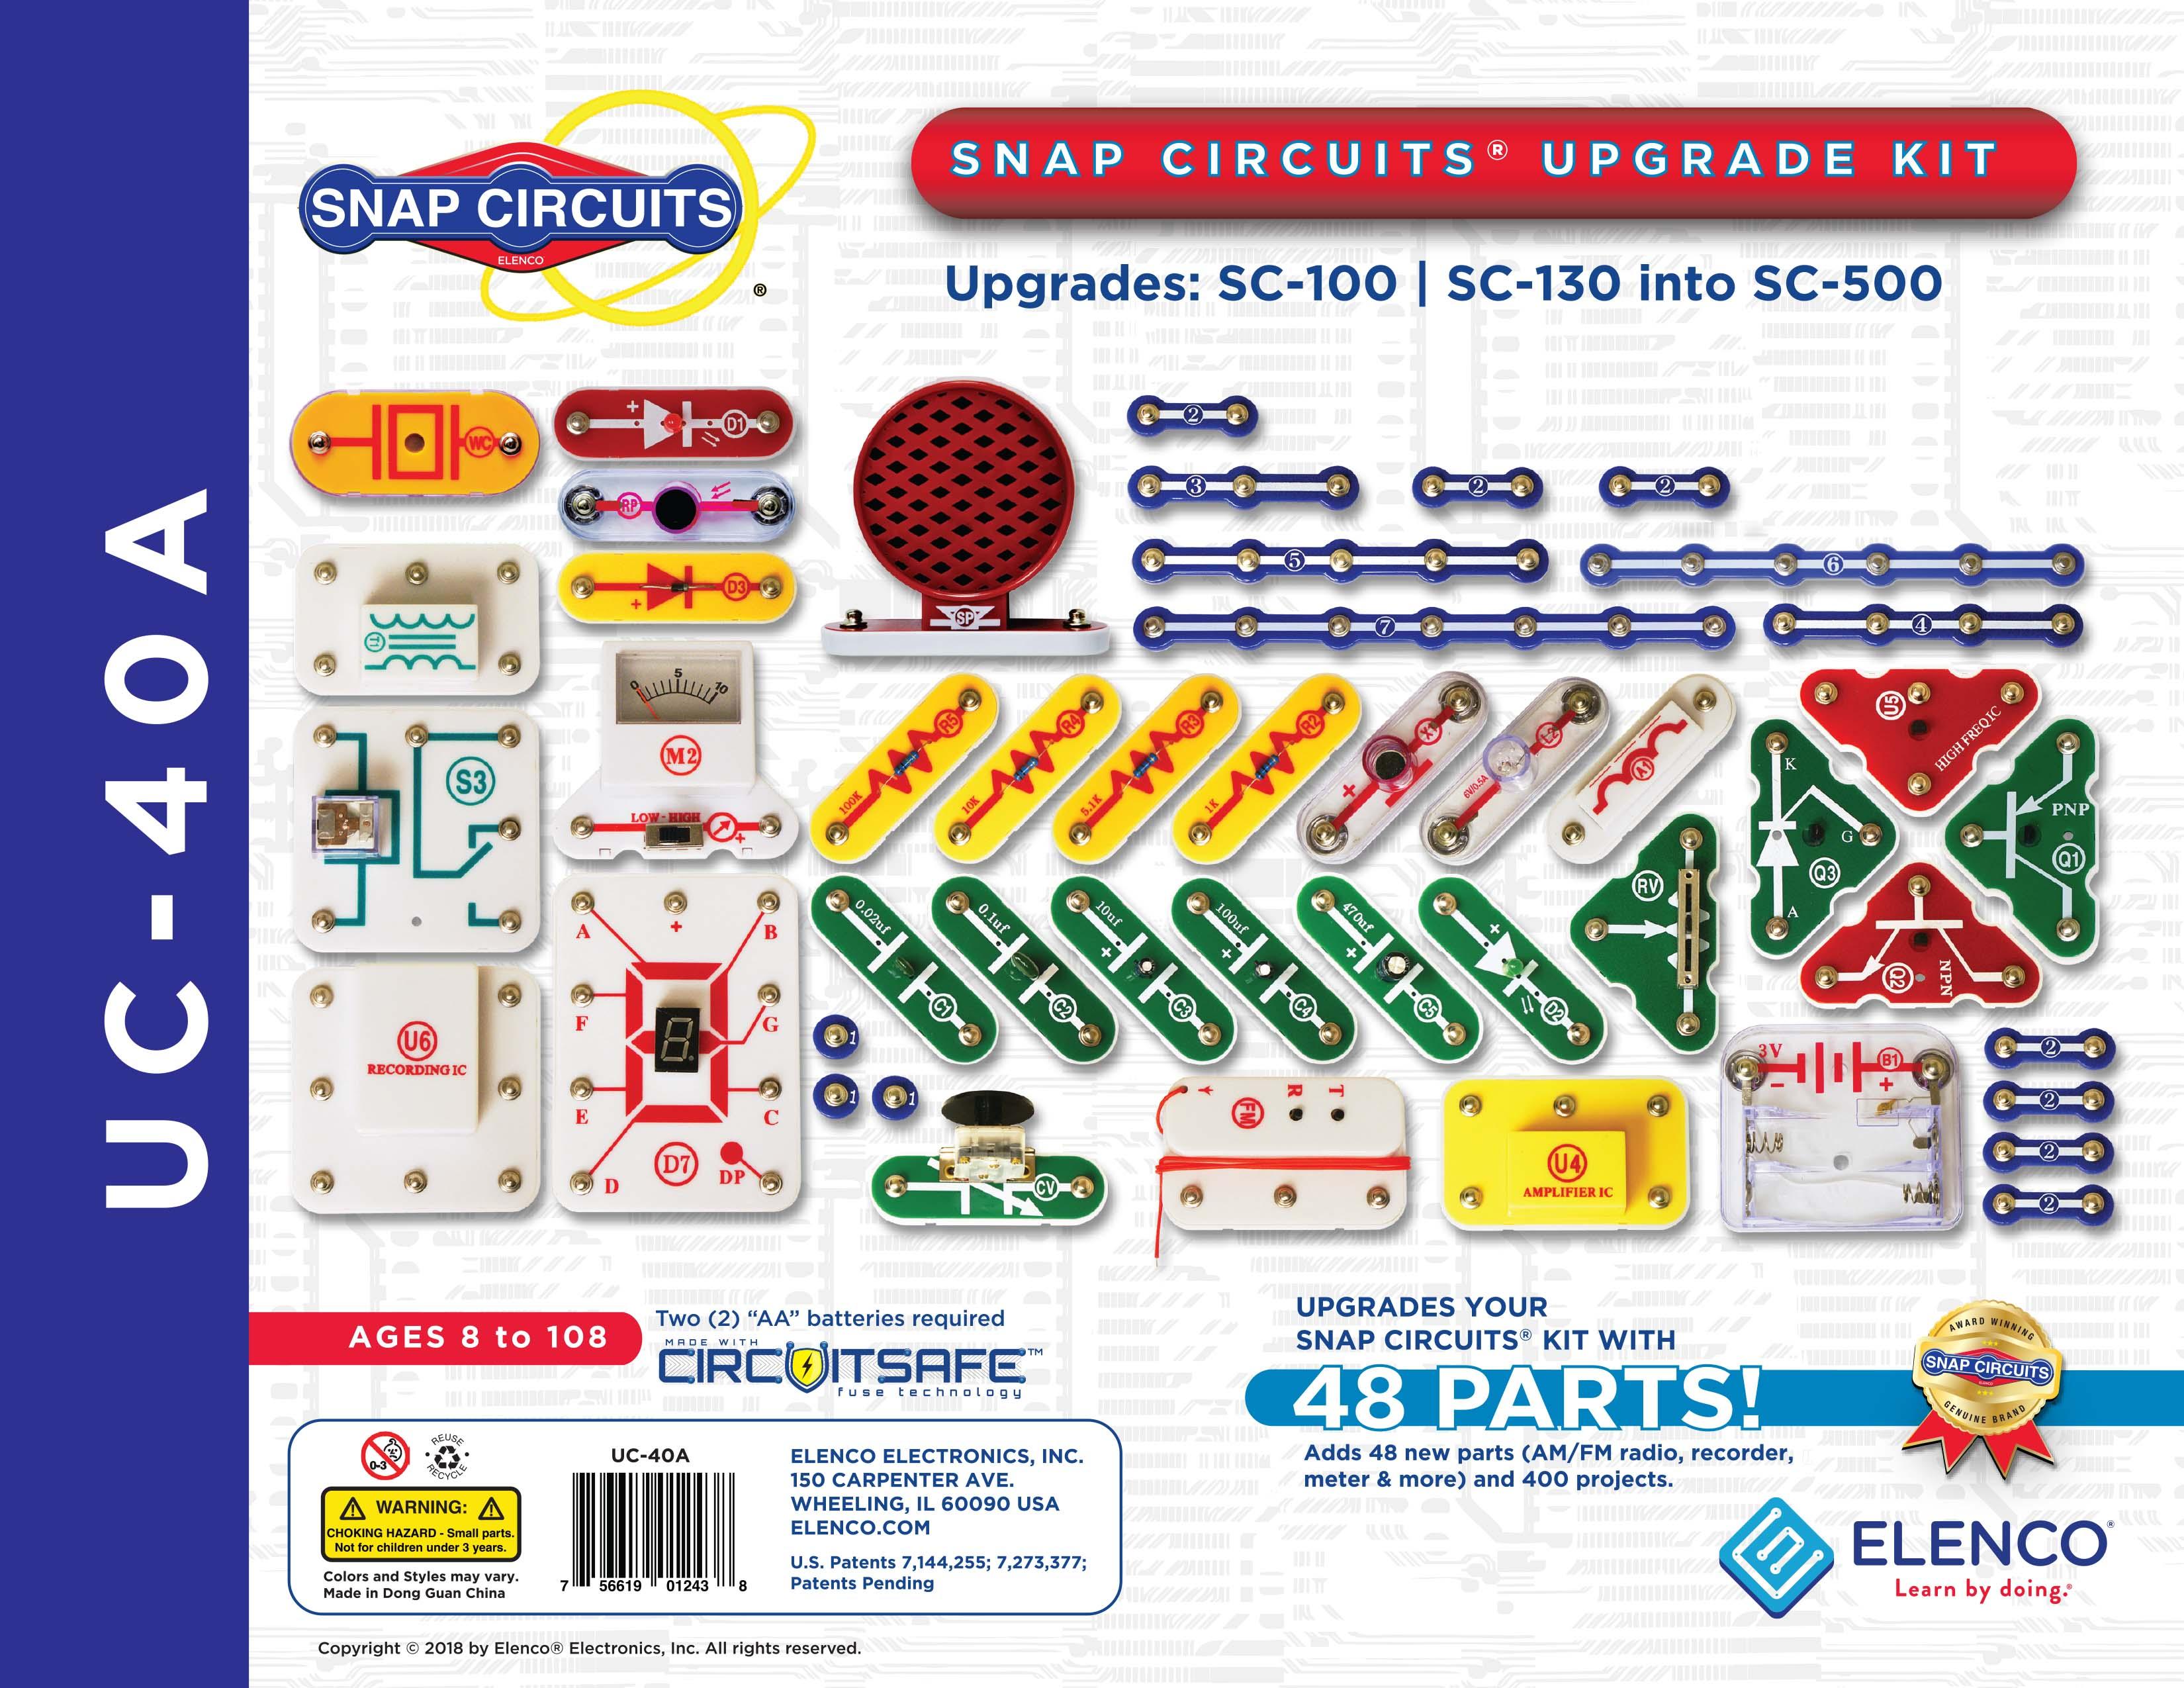 uc 40a snap circuits upgrade kit elenco electronicssnap circuits® upgrade kit sc100 sc130 into sc500